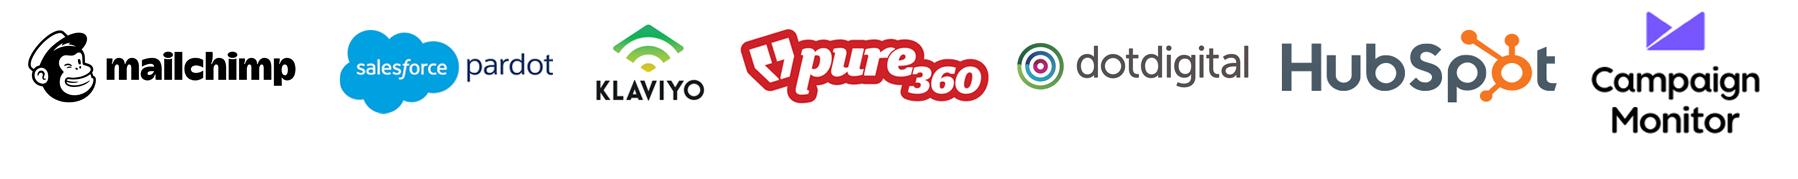 Mailchimp, Salesforce Pardot, Klaviyo, Pure 360, Hubspot, Campaign Monitor, Dotdigital